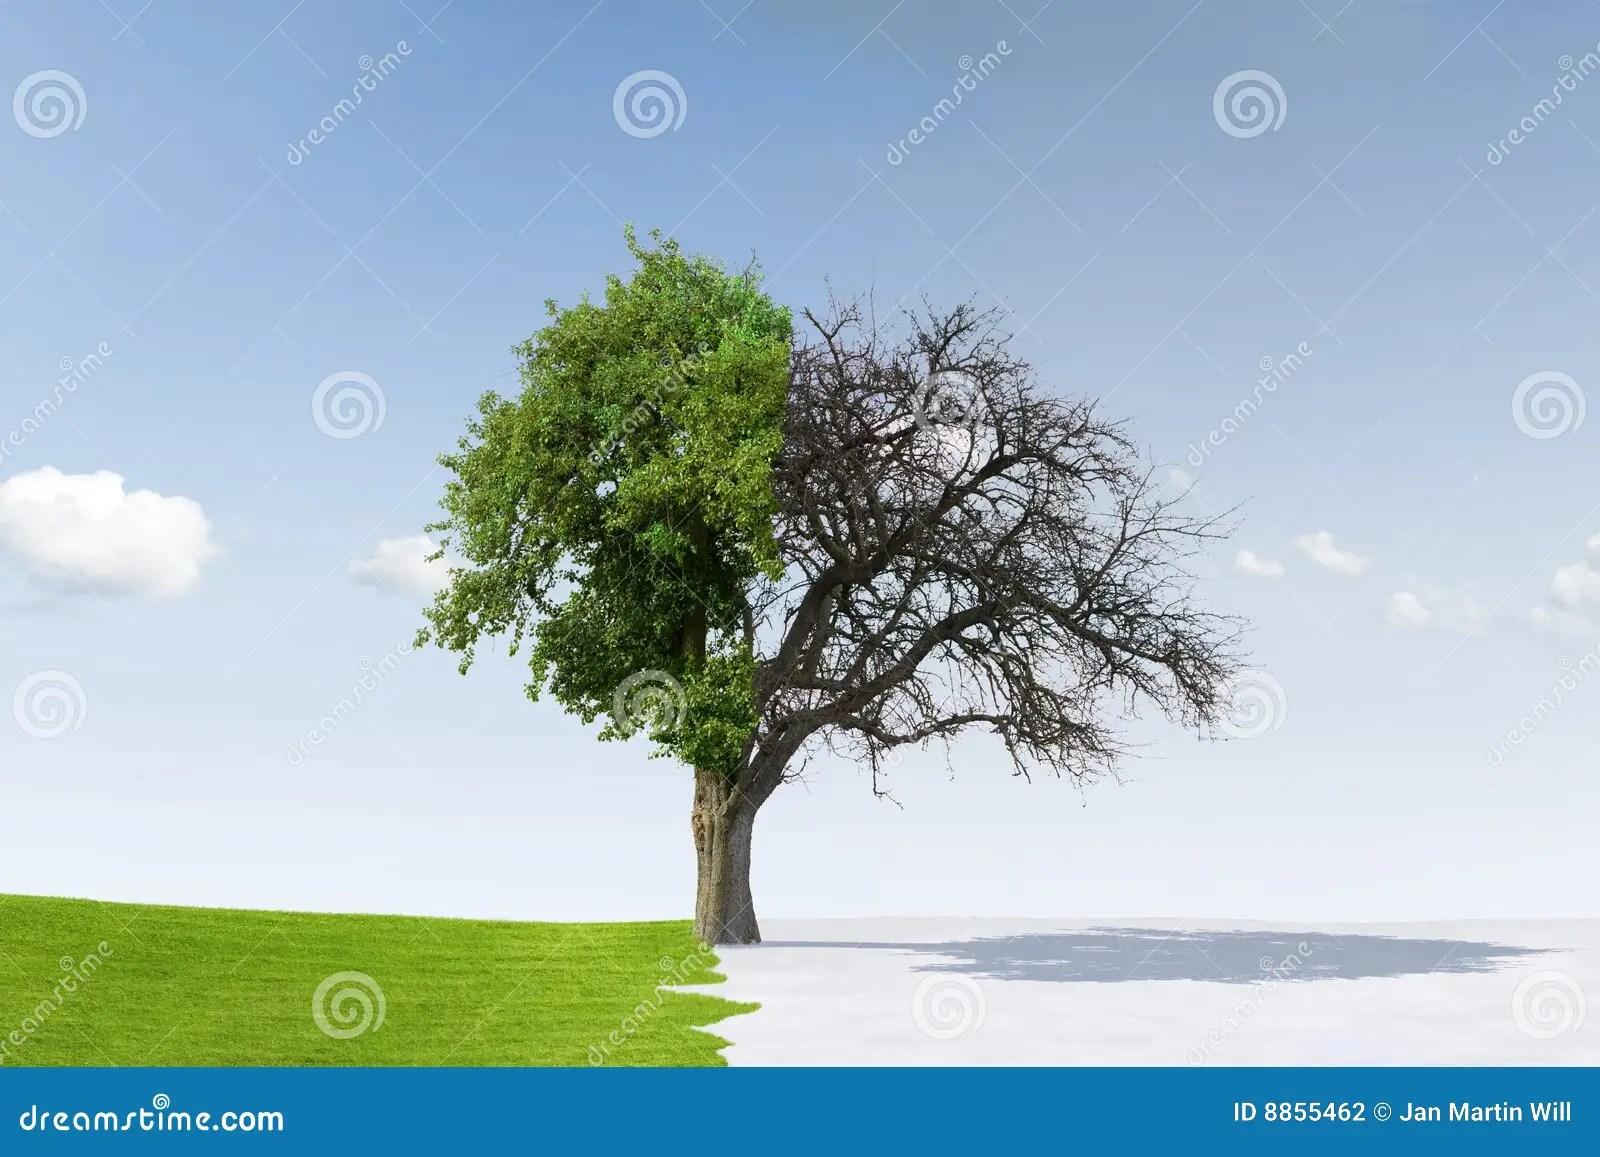 Tree Changing Seasons Stock Photo Image Of Leafy